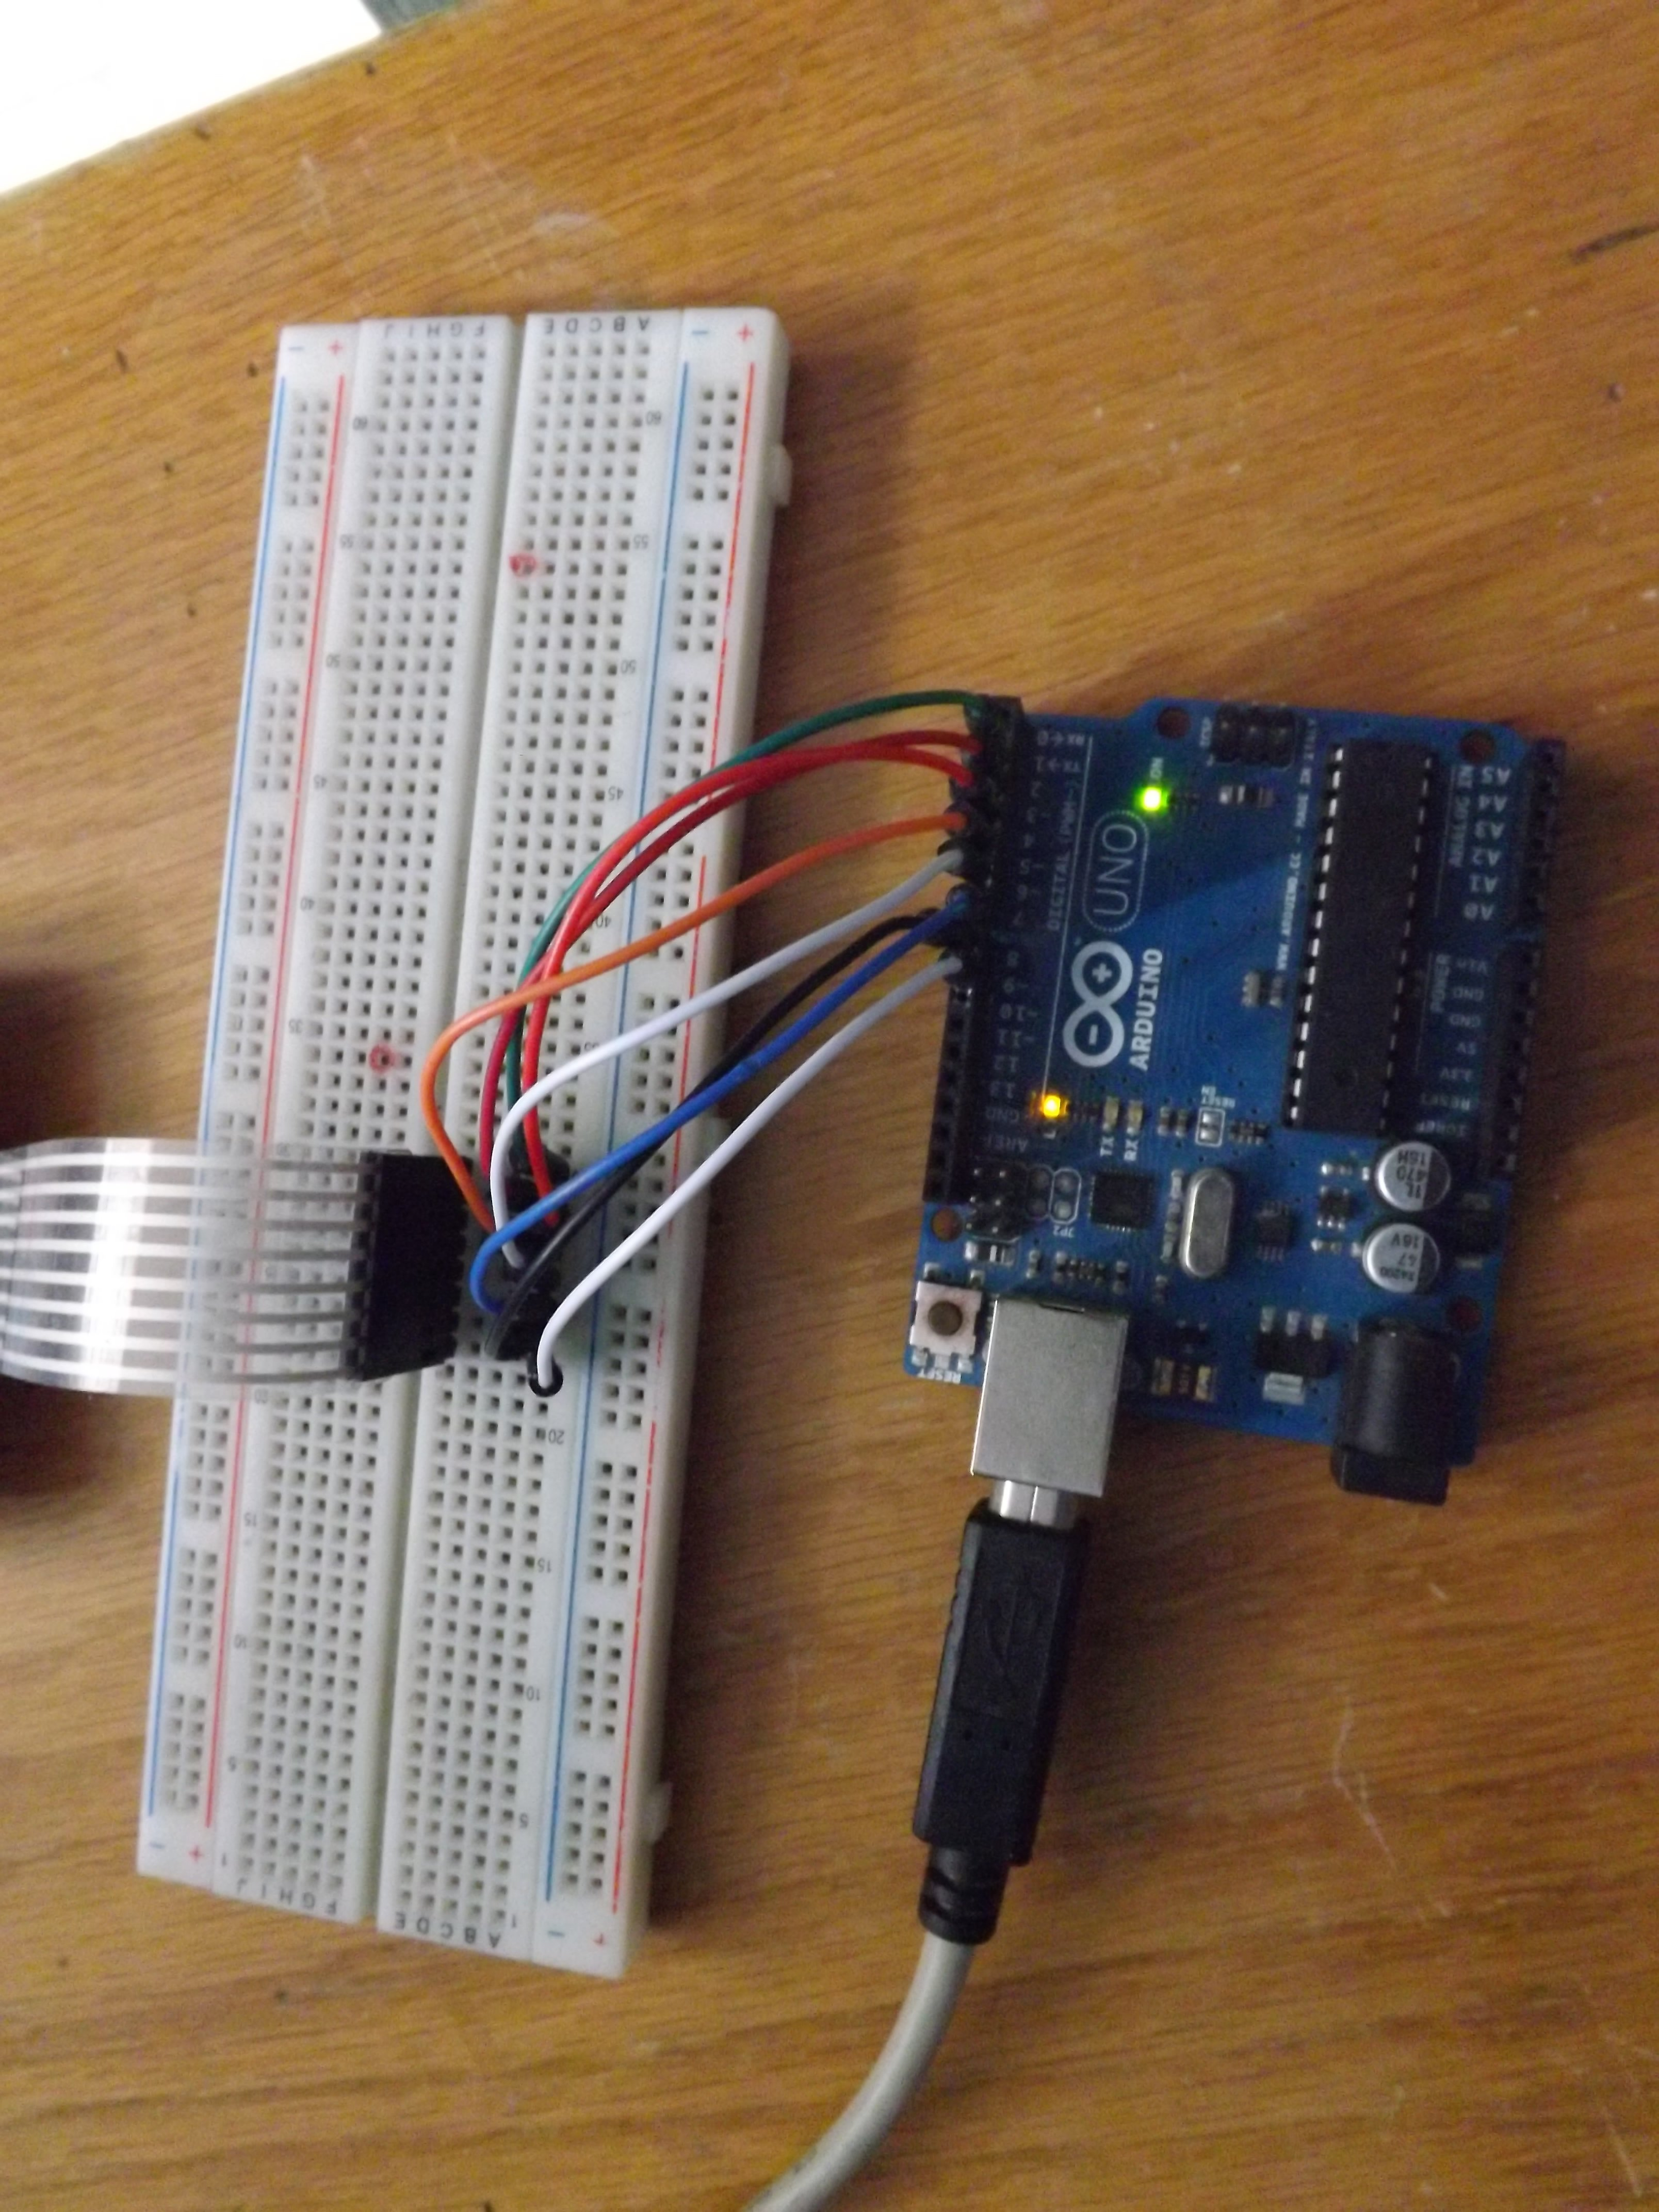 imagen5: led del pin 13 del arduino encendido